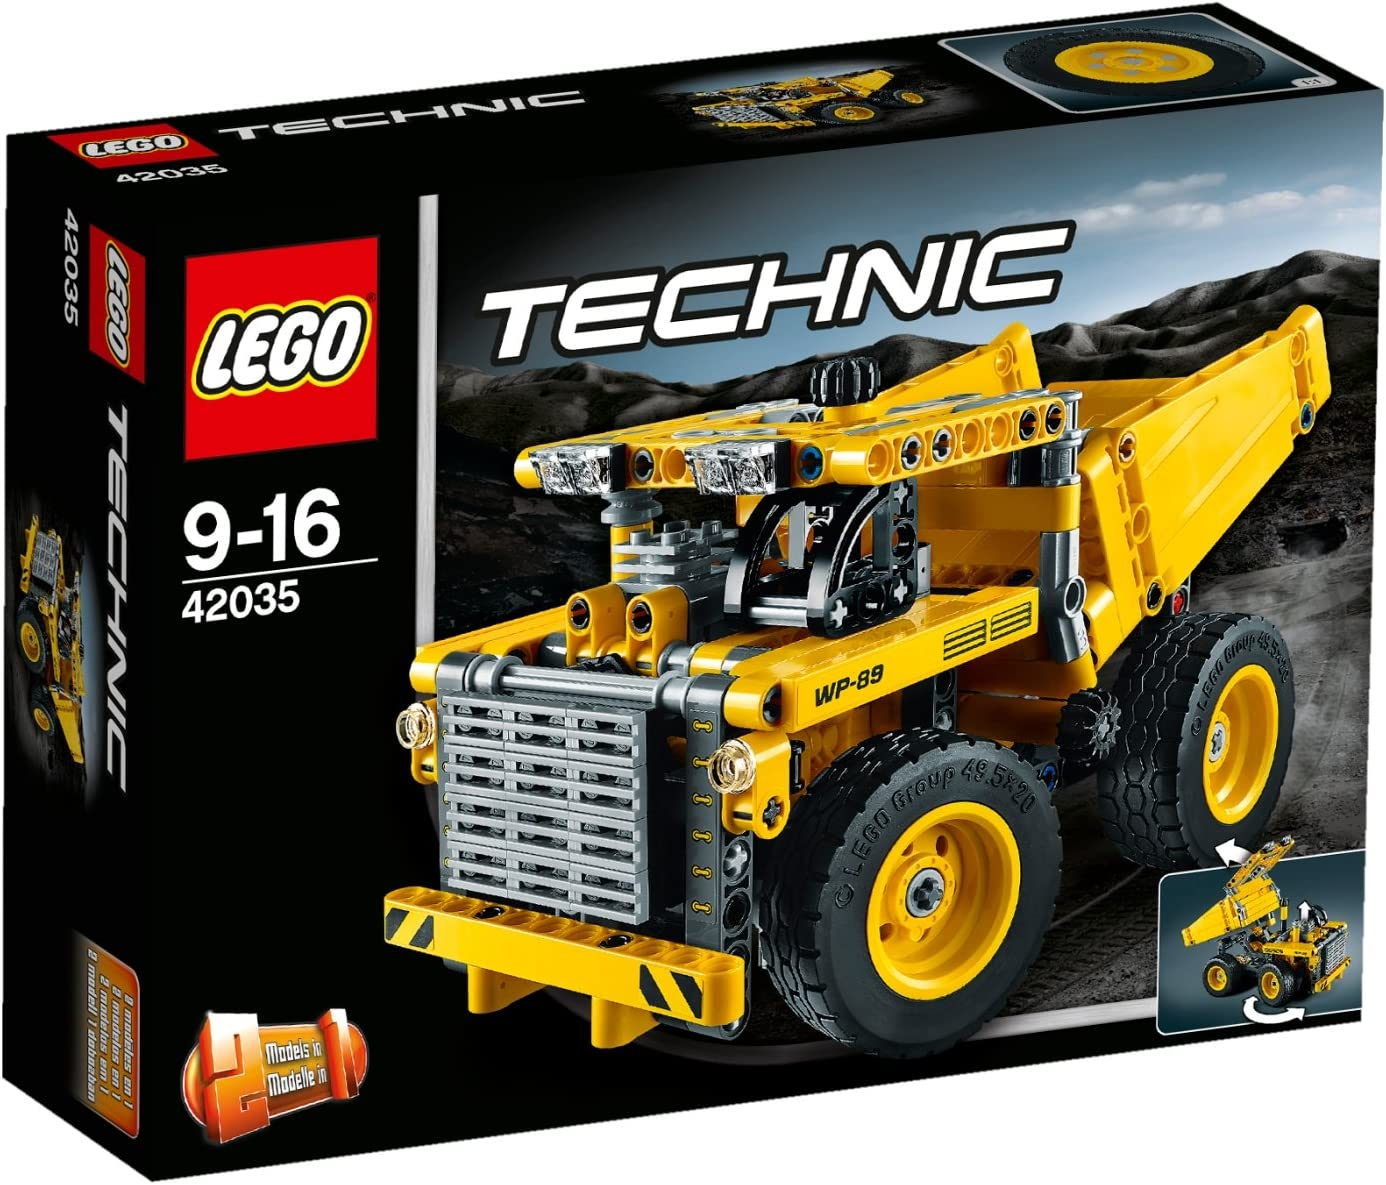 LEGO Technic Mining Truck Model 362 Pieces Kids Building Playset | 42035